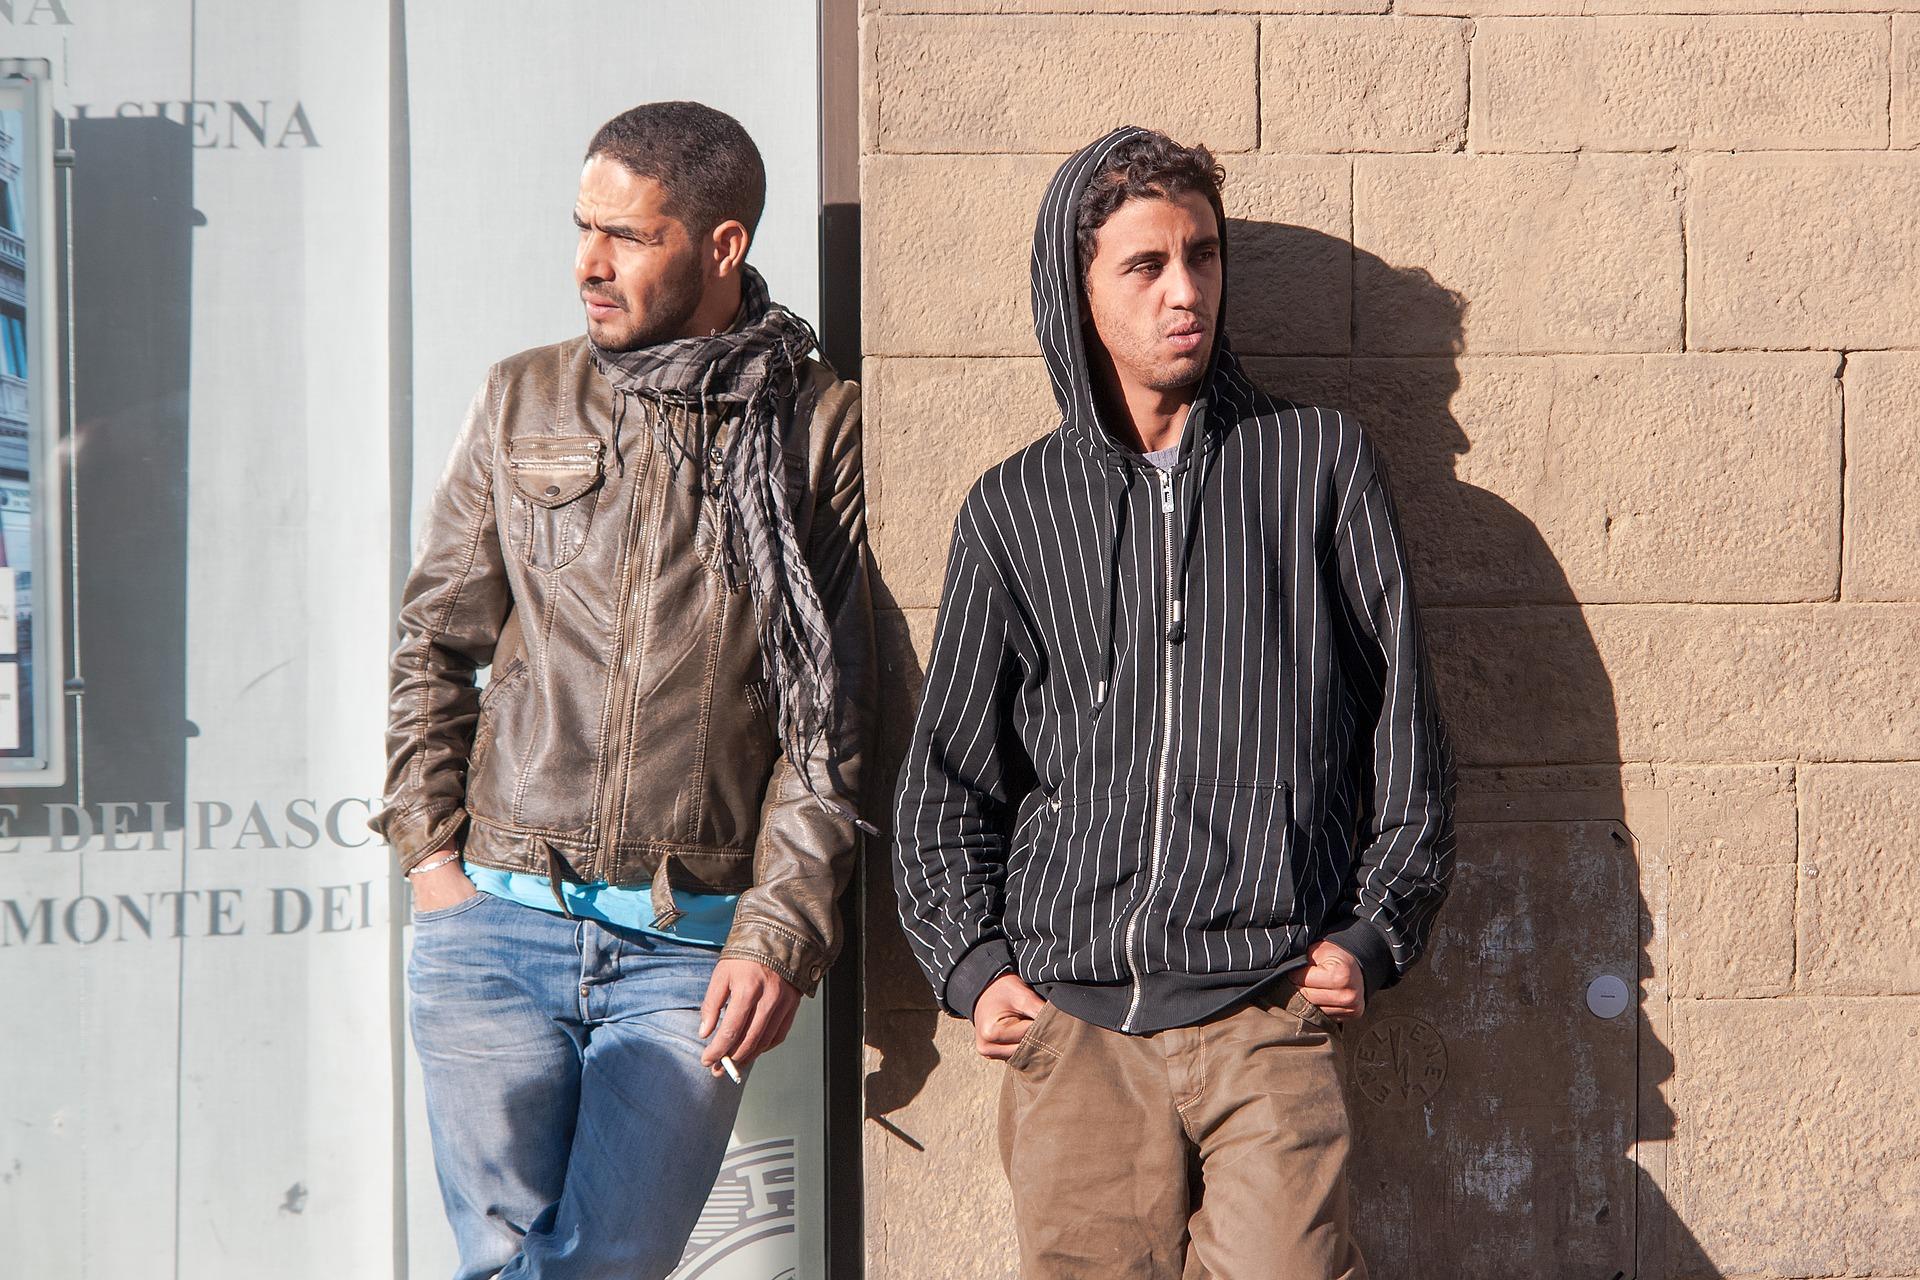 Asylbehörde: Corona-Krise wird Asylanträge in Europa steigen lassen